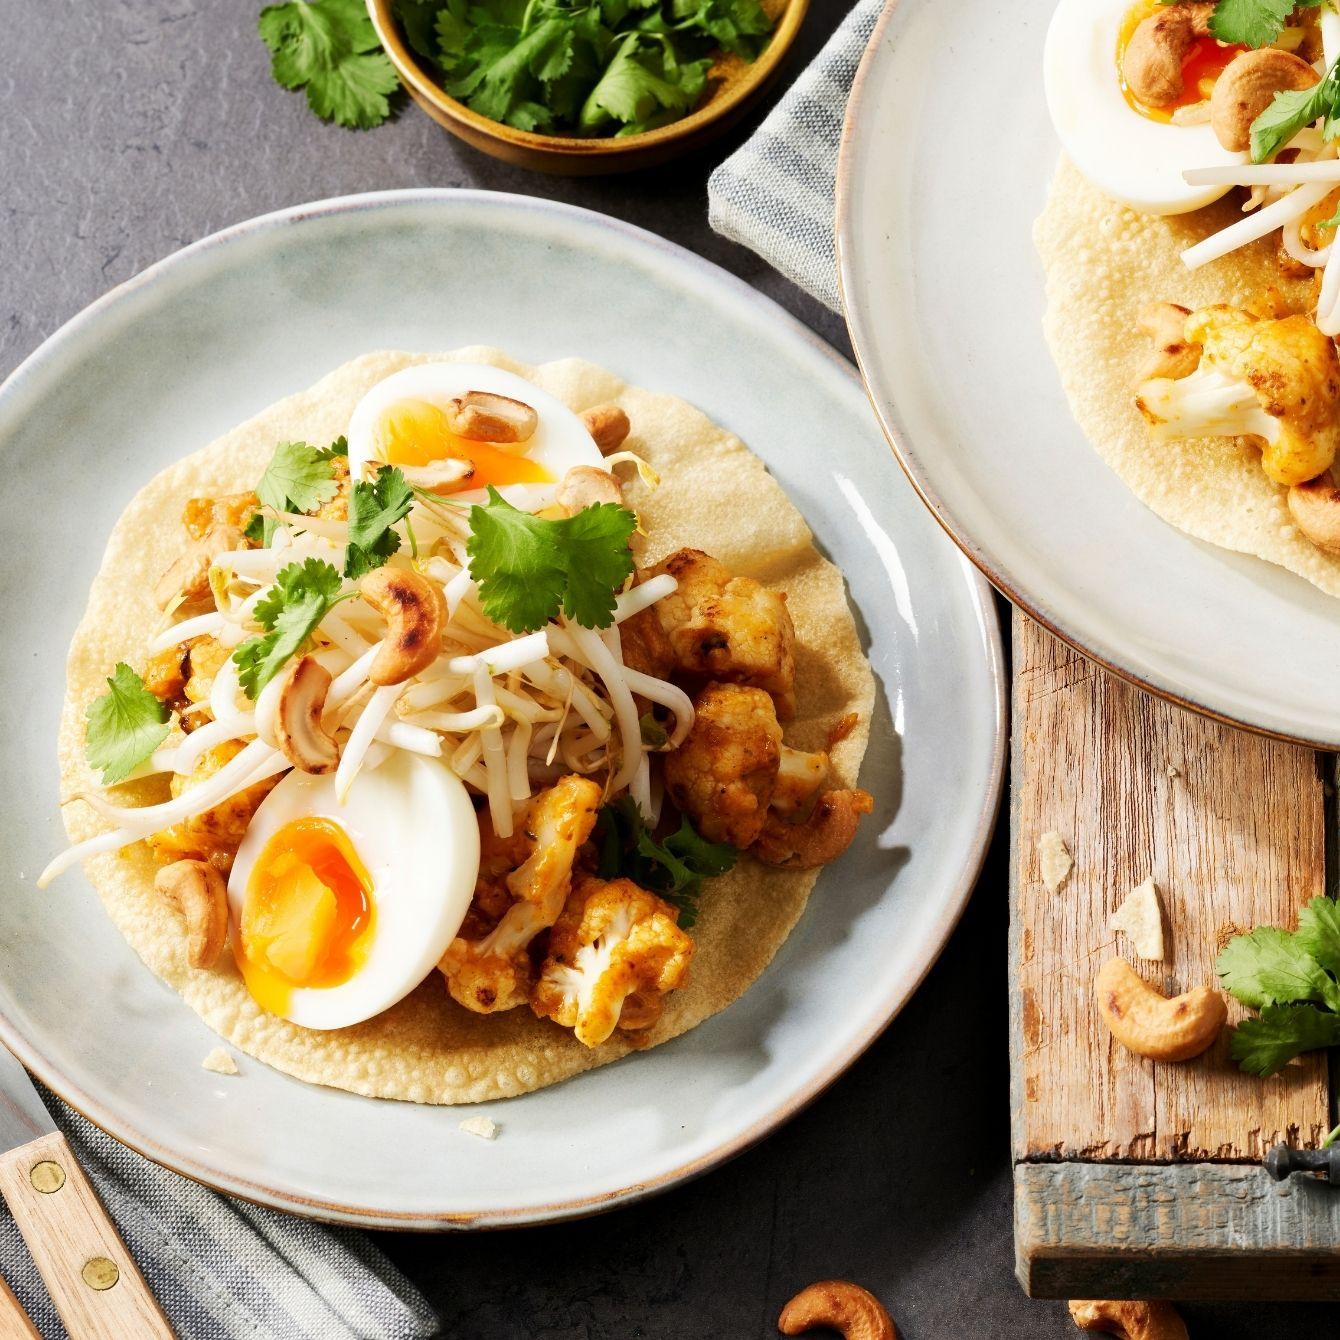 Krokante papadum met curry van bloemkool en kipstuckjes